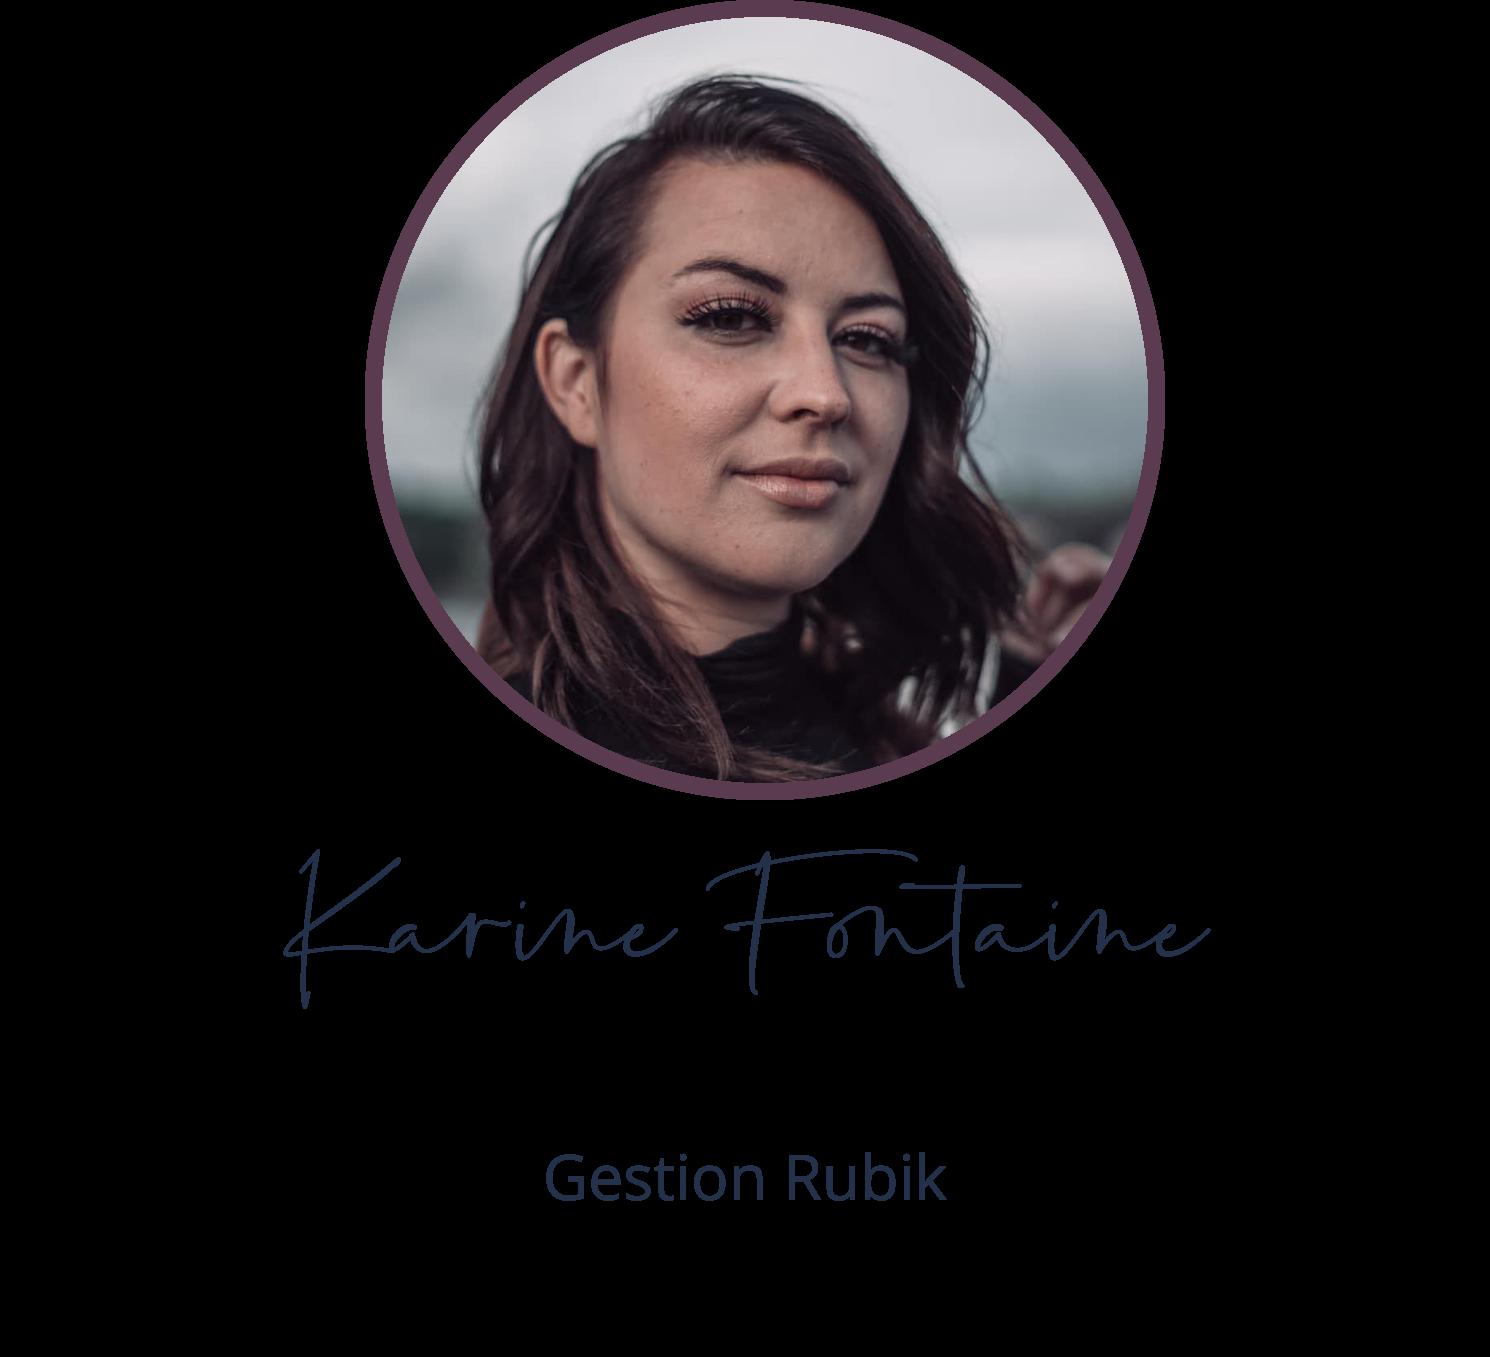 Karine Fontaine - Gestion Rubik